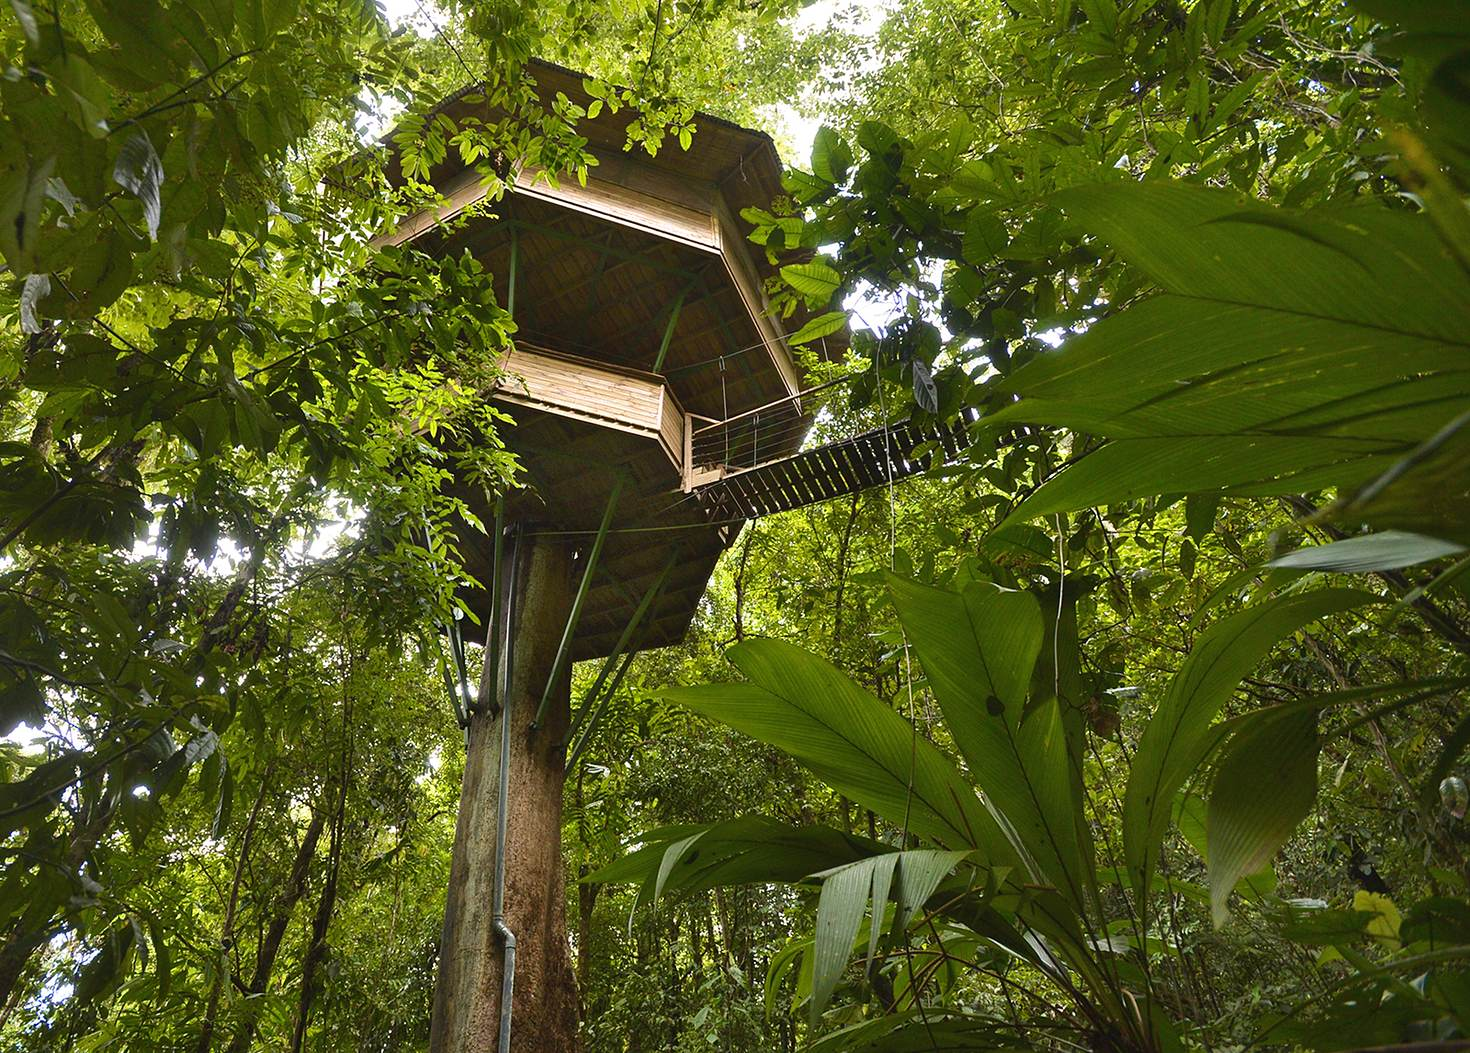 The tree house named El Castillo at Finca Bellavista © Jeremy Papasso / Finca Bellavista